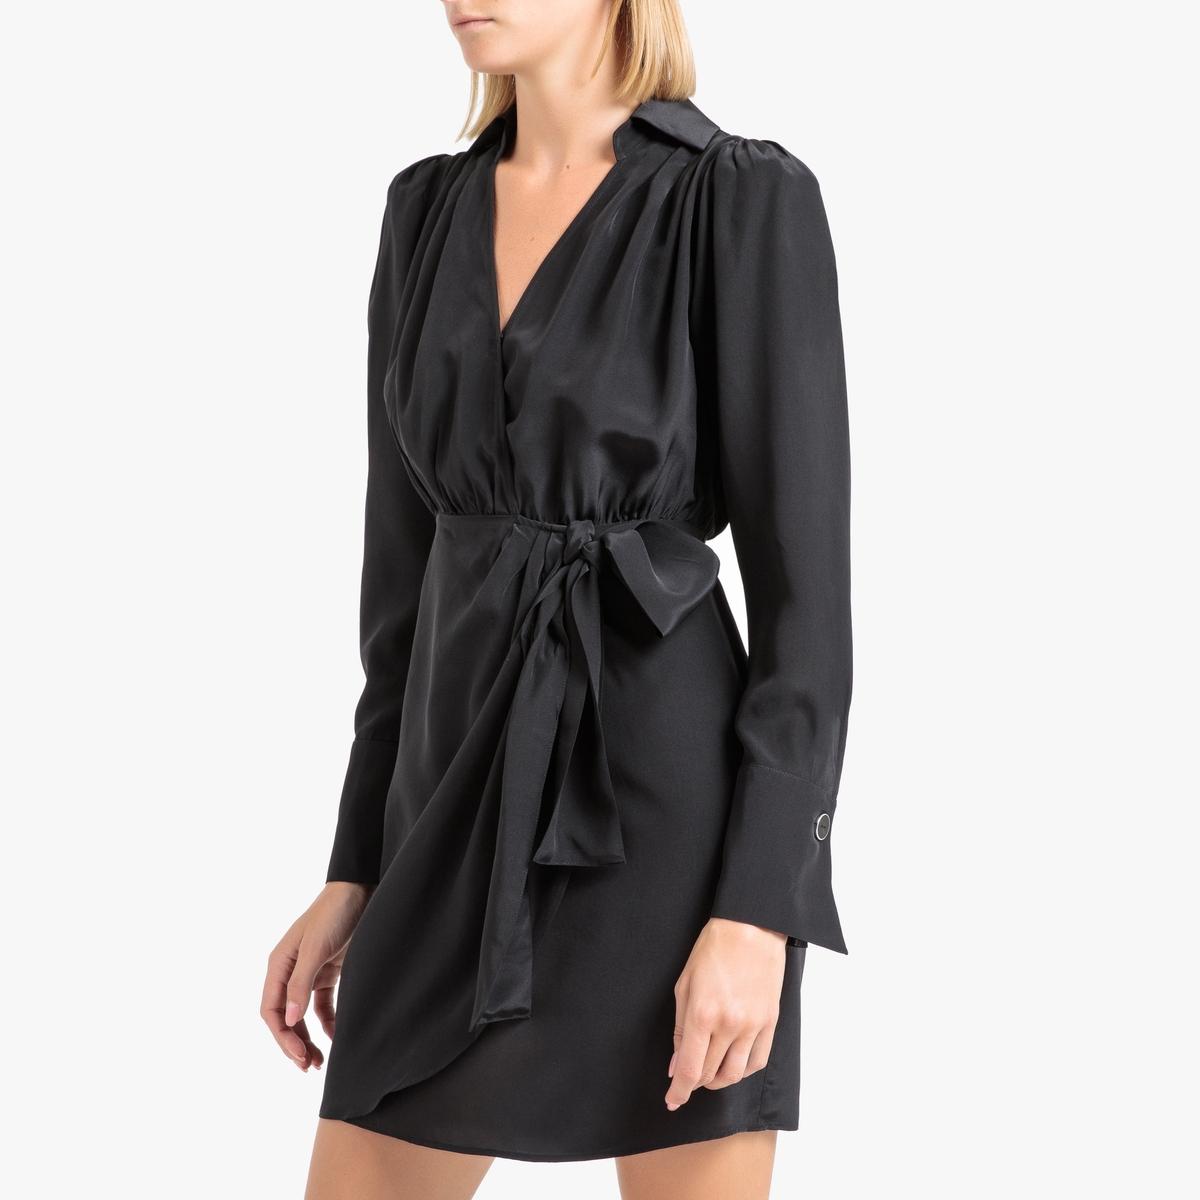 Фото - Платье La Redoute Короткое с длинными рукавами из шелка 3(L) черный l roche fernand cortez ou la conquete du mexique